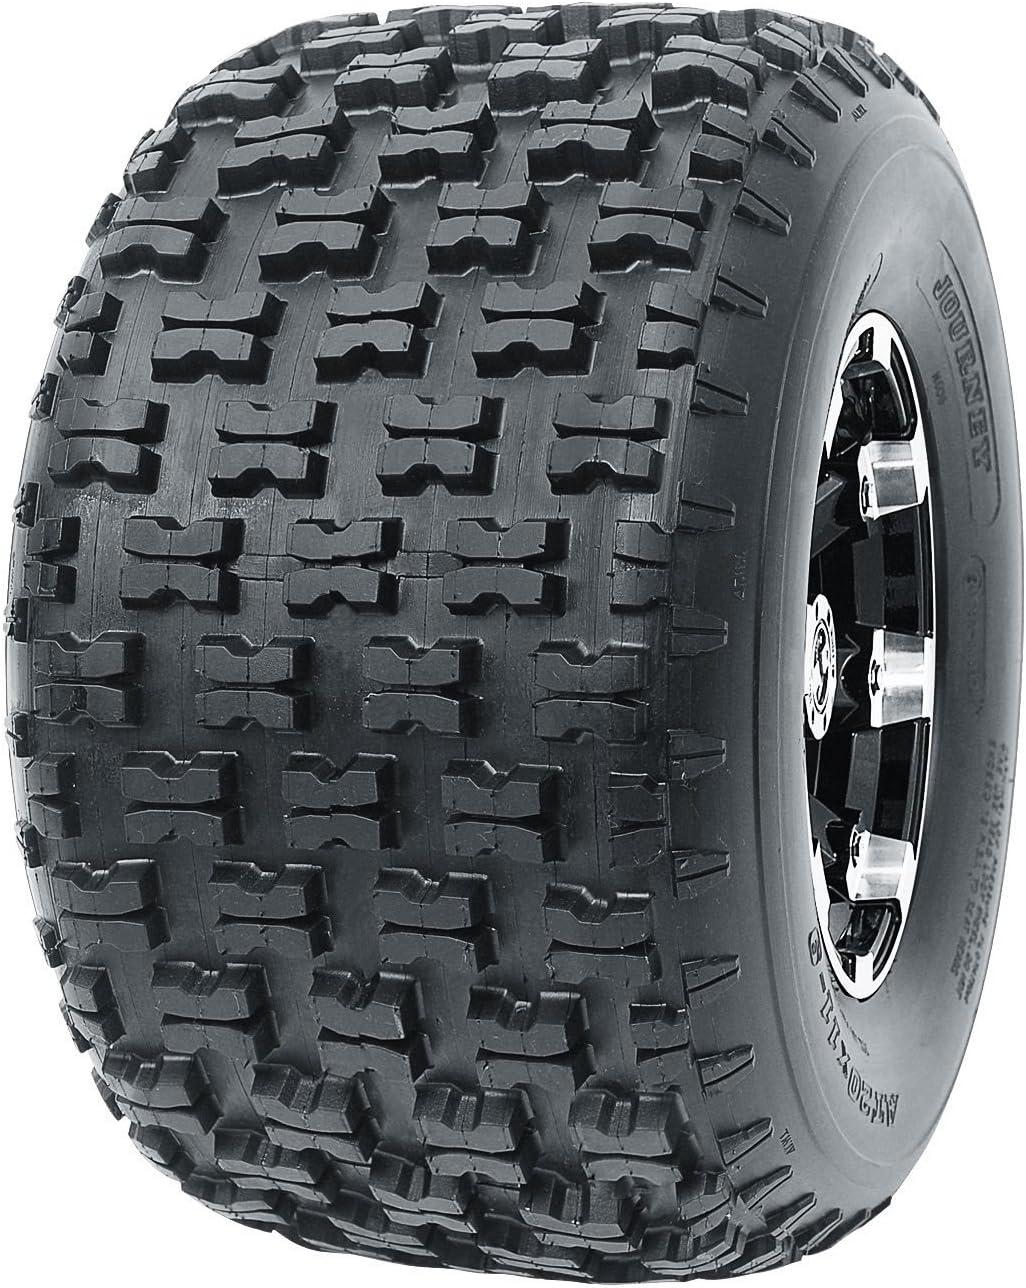 10035 One New WANDA Sport ATV Tires 19X7-8  4PR